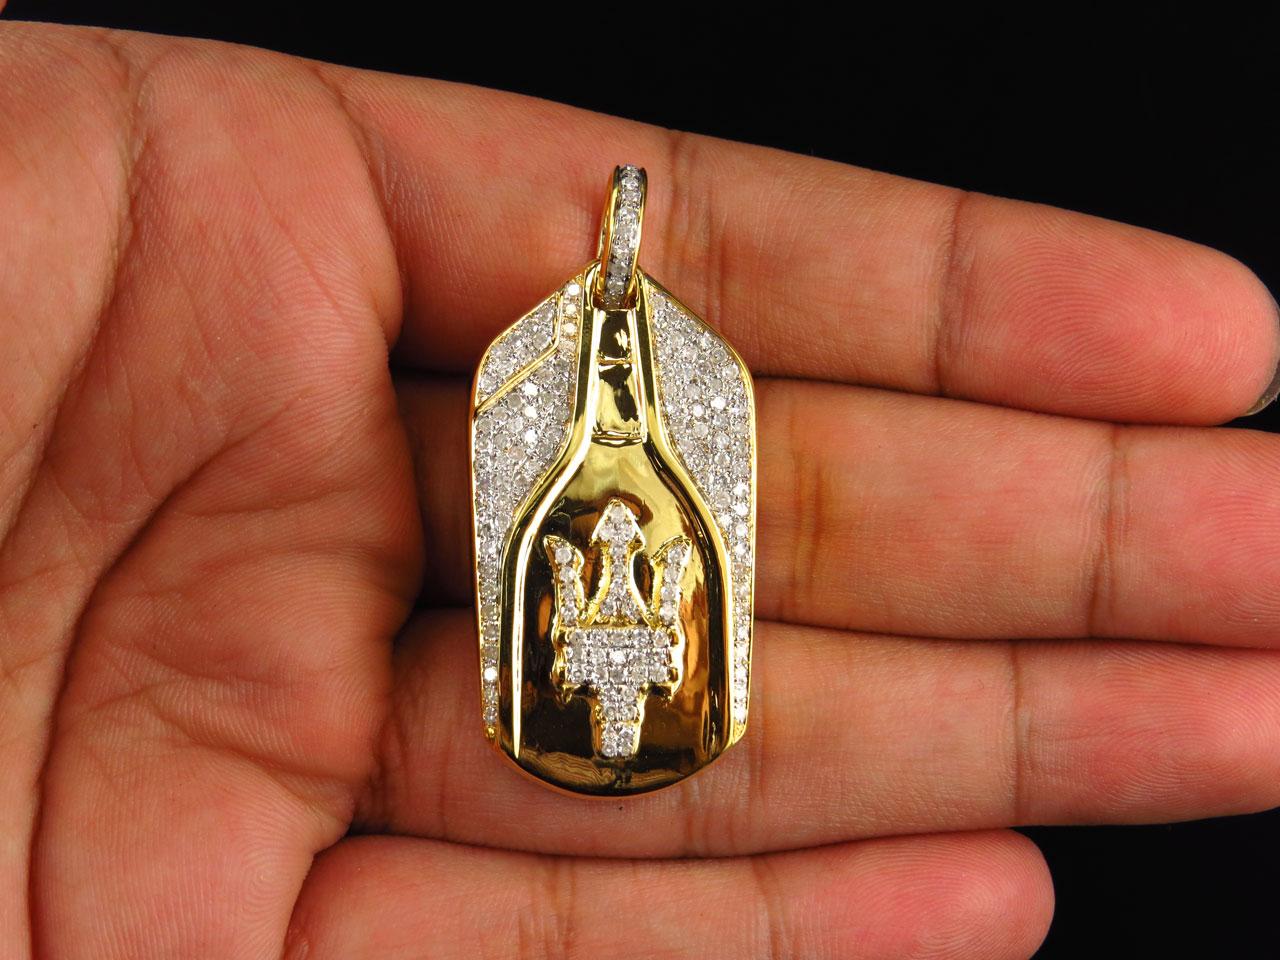 Mens solid 10k yellow gold maserati key diamond pendant 175 in mens solid 10k yellow gold maserati key diamond pendant 175 in charm 15 ct ebay aloadofball Gallery